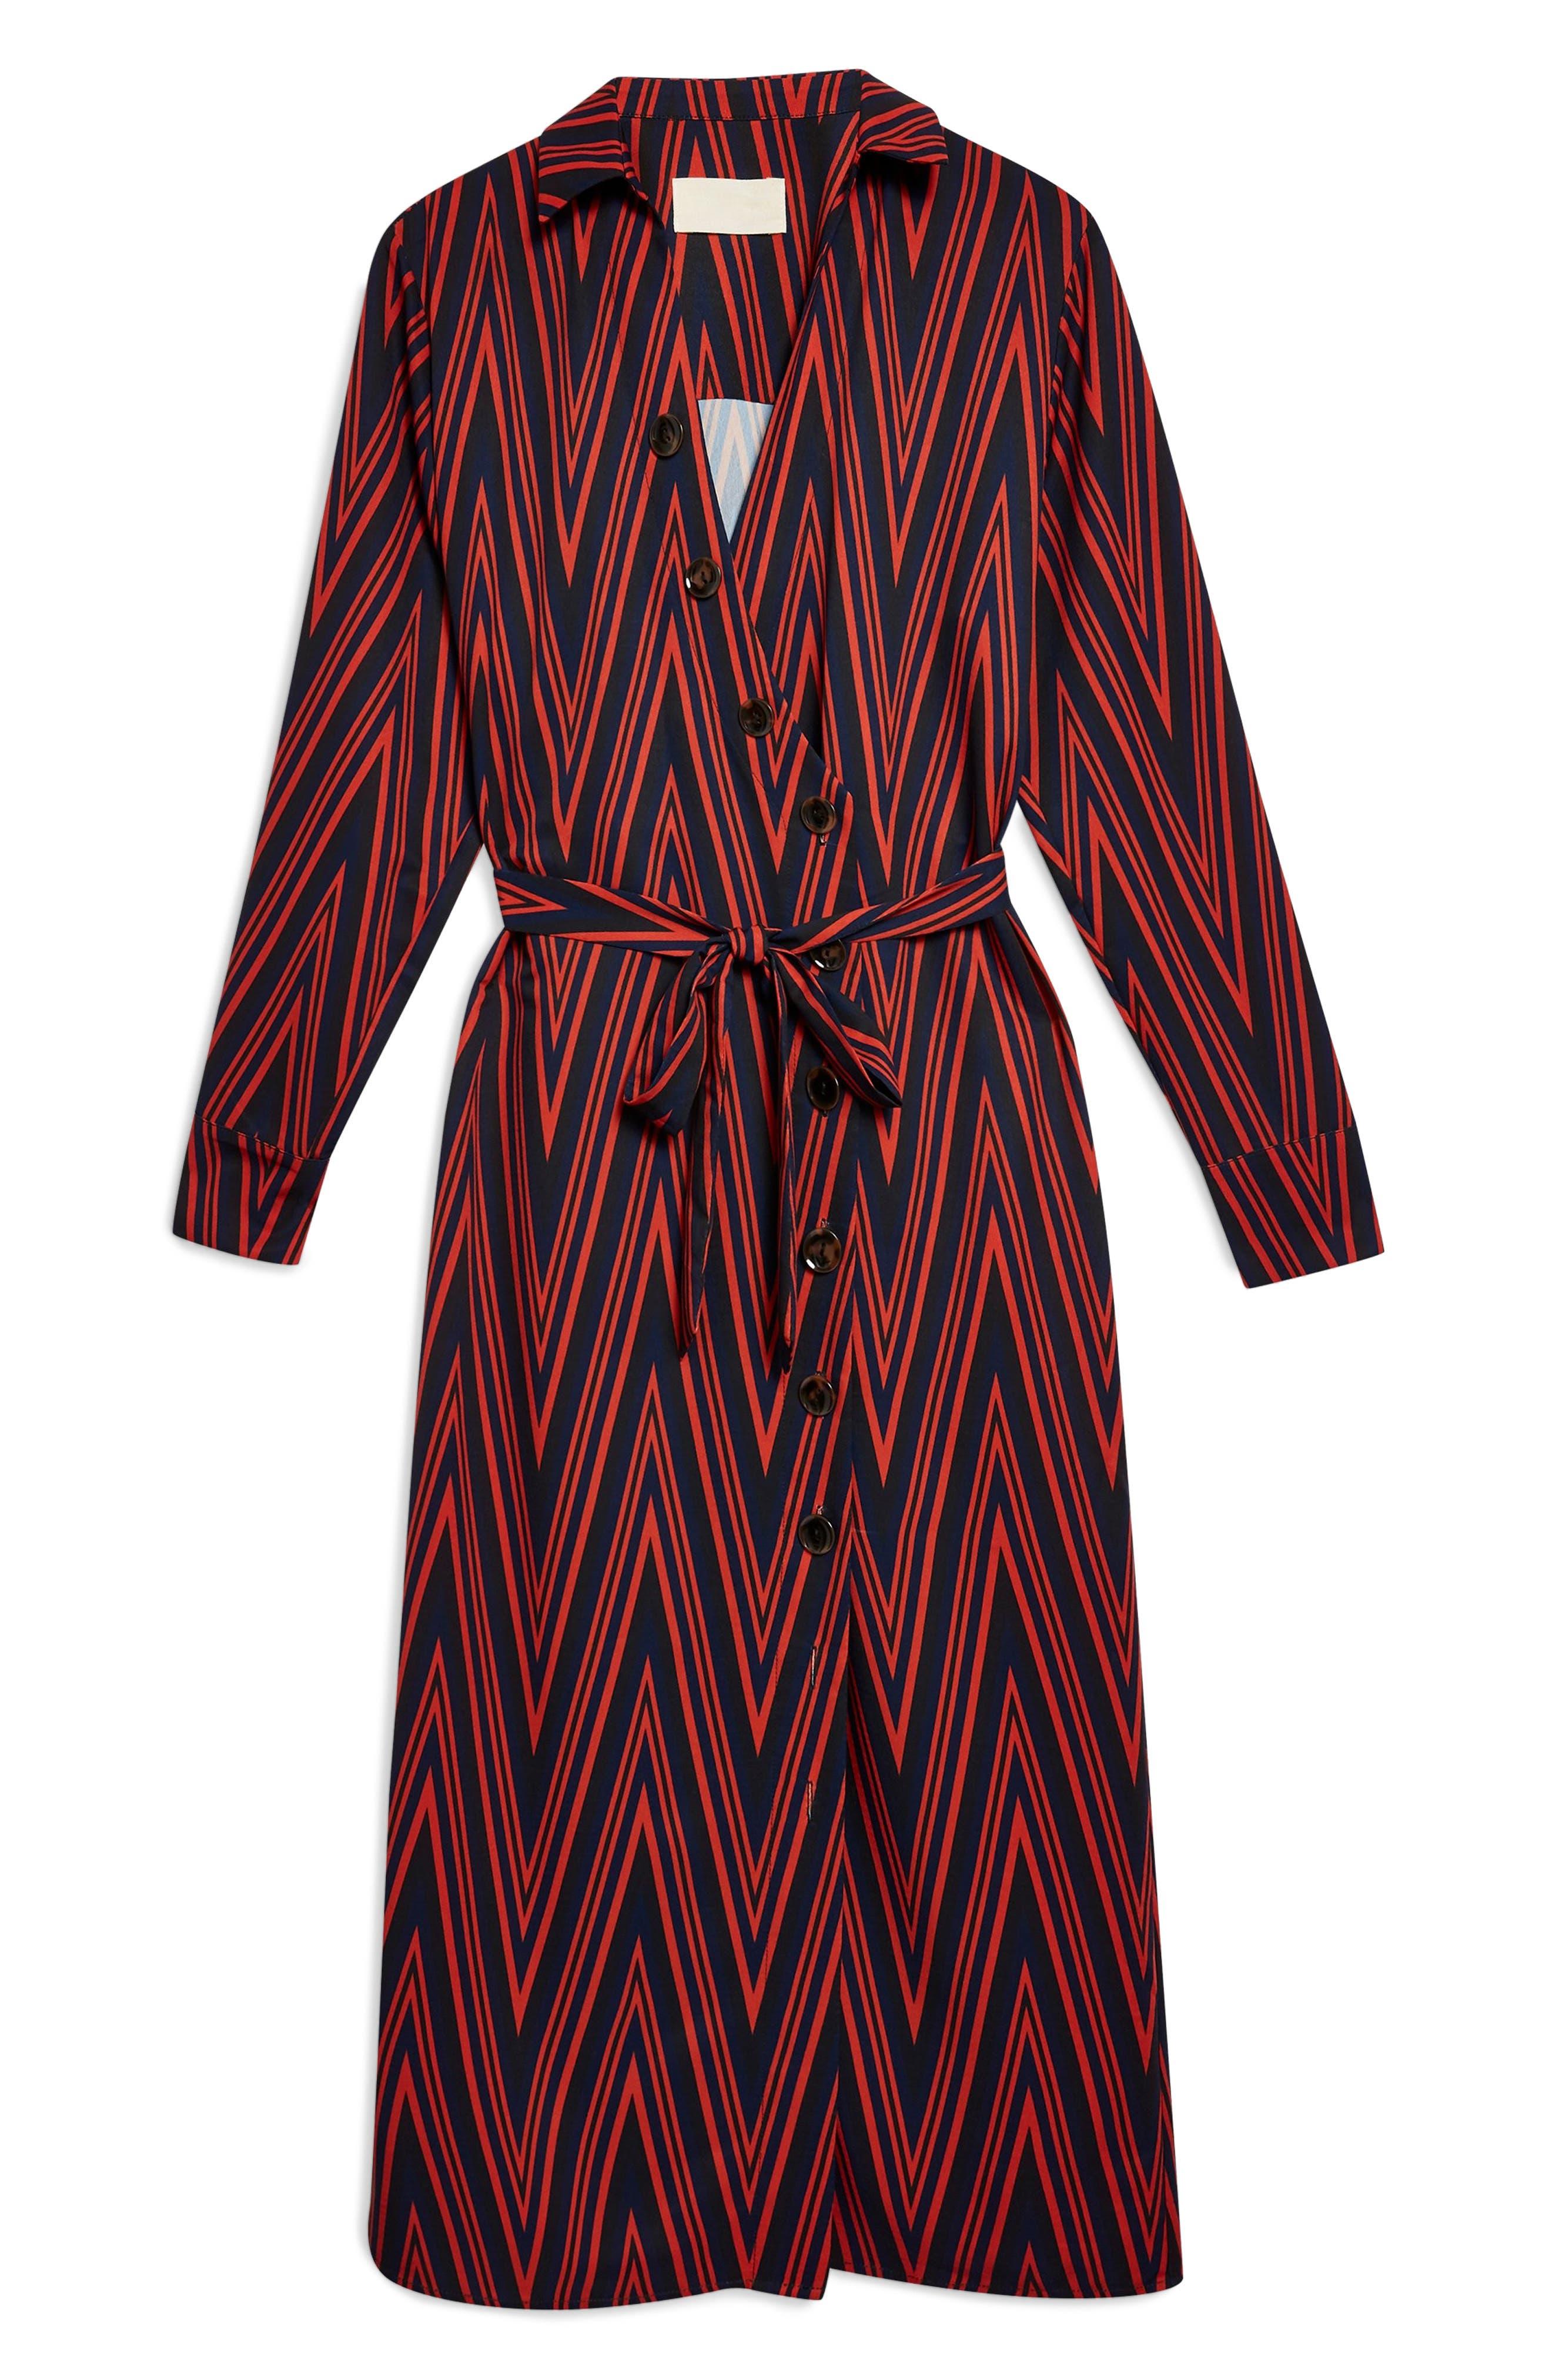 TOPSHOP,                             Horn Button Print Midi Dress,                             Alternate thumbnail 6, color,                             220